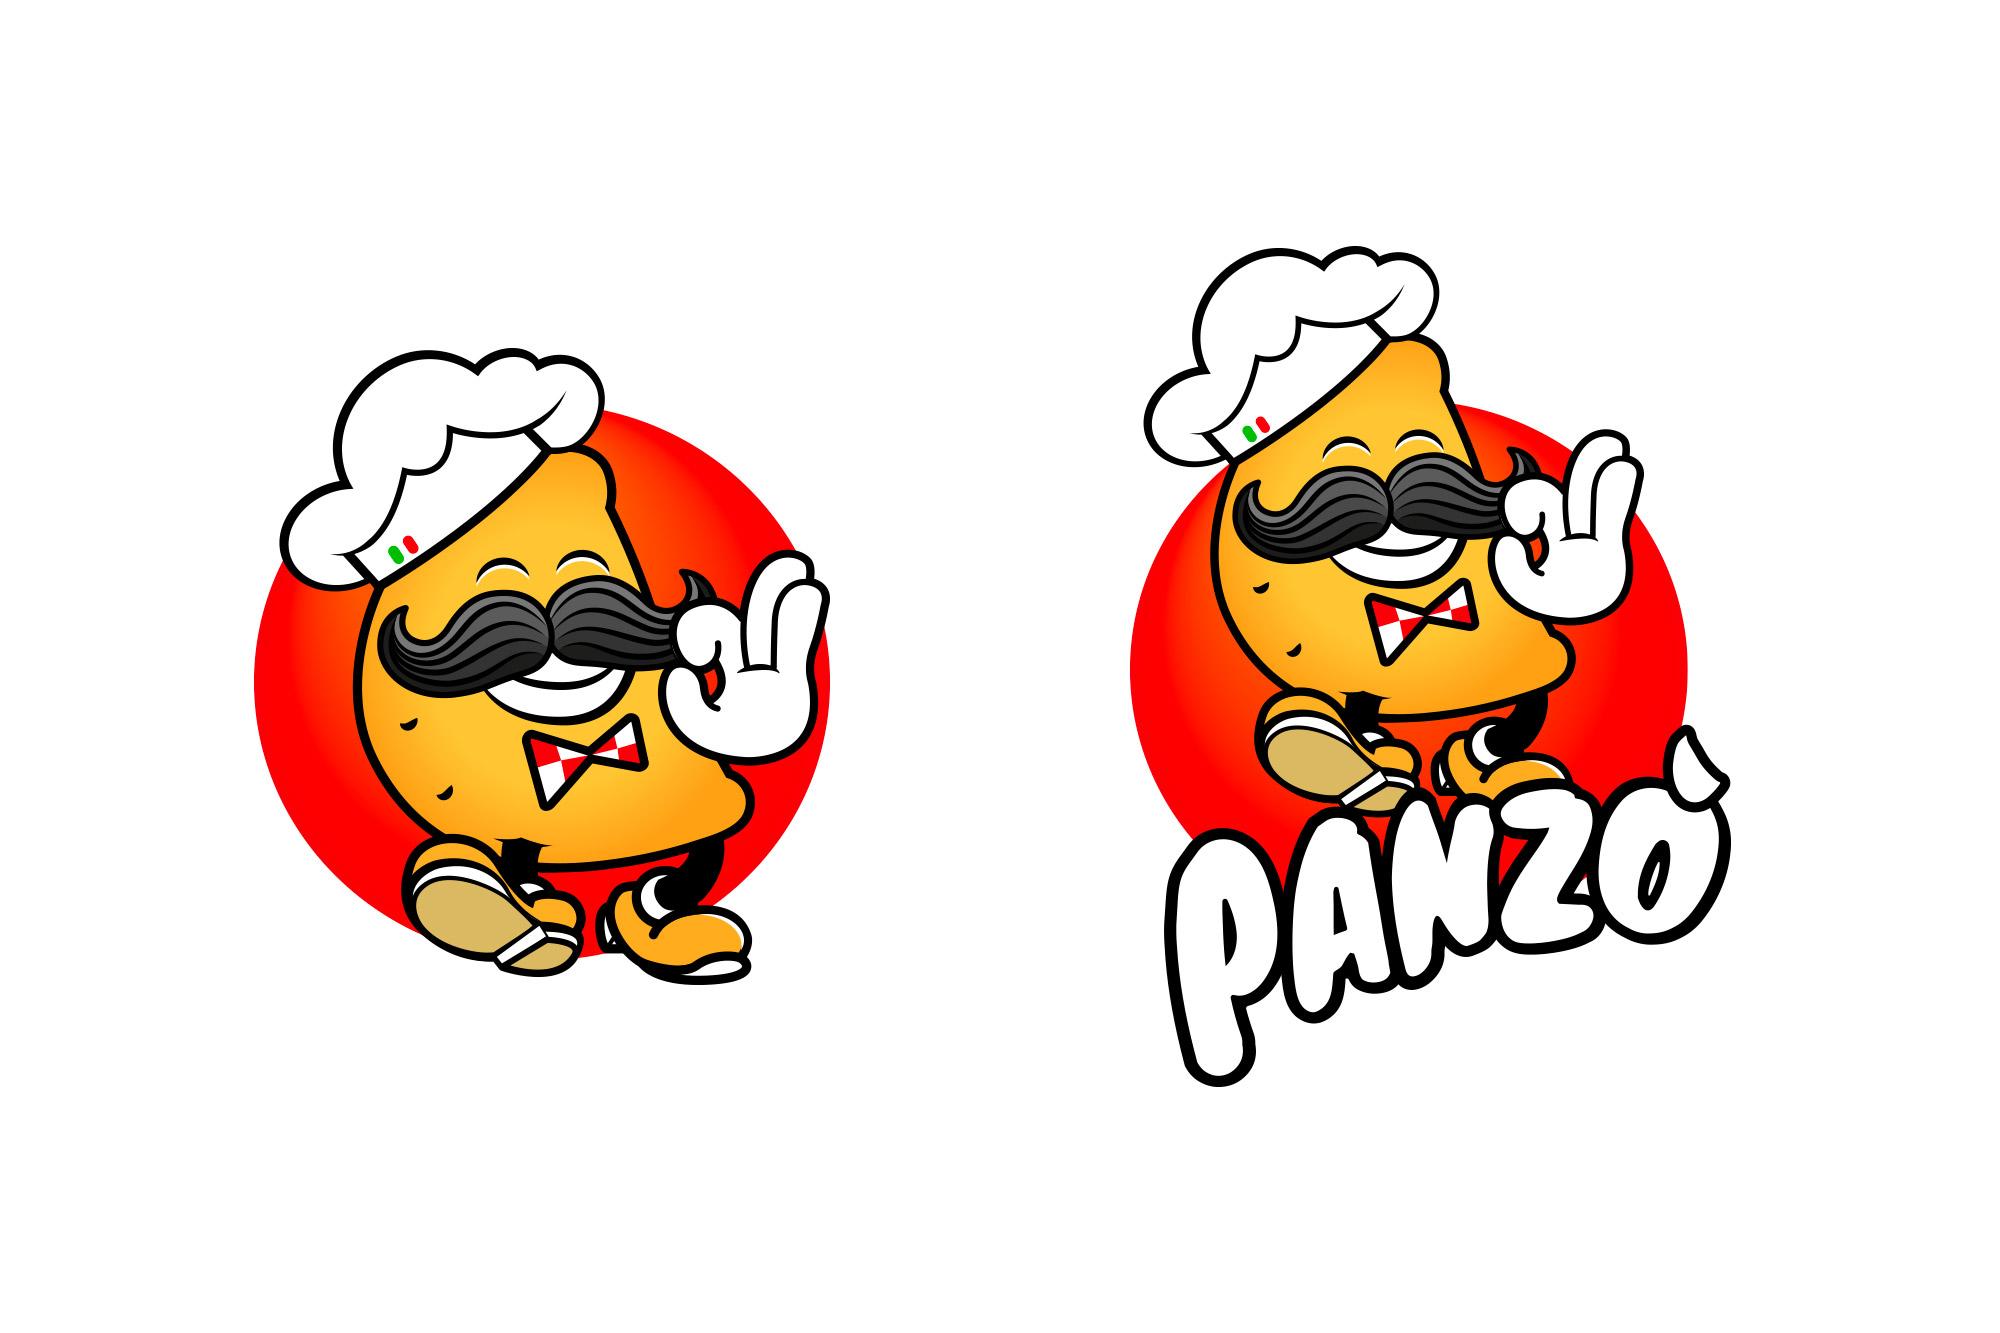 Panzò - Panzerotto da passeggio - logo, branding - img 3